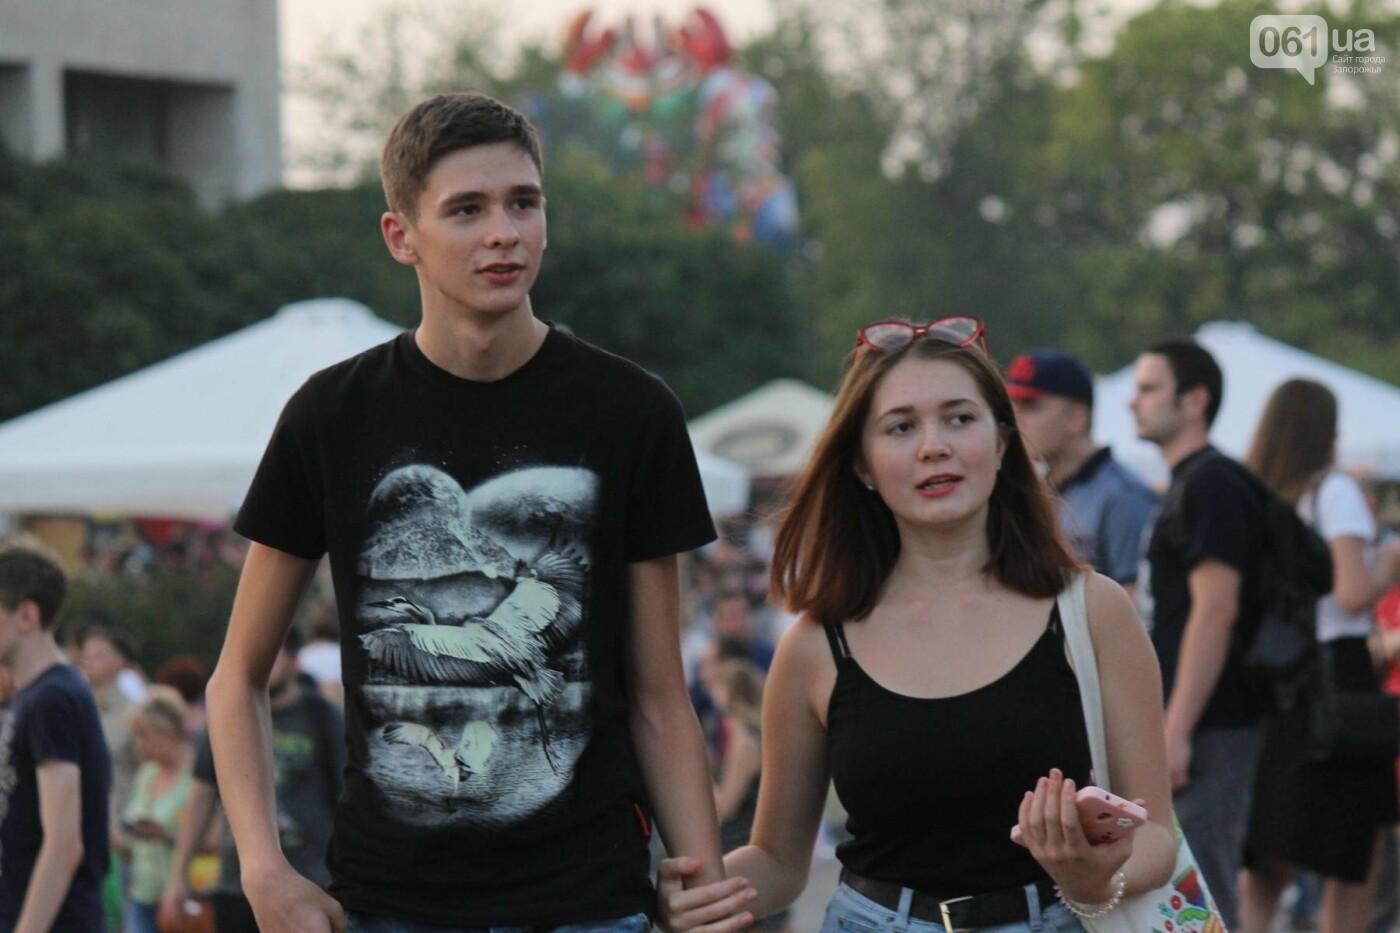 Найди себя: 50 портретов посетителей фестиваля Khortytsia Freedom, – ФОТОРЕПОРТАЖ, фото-9